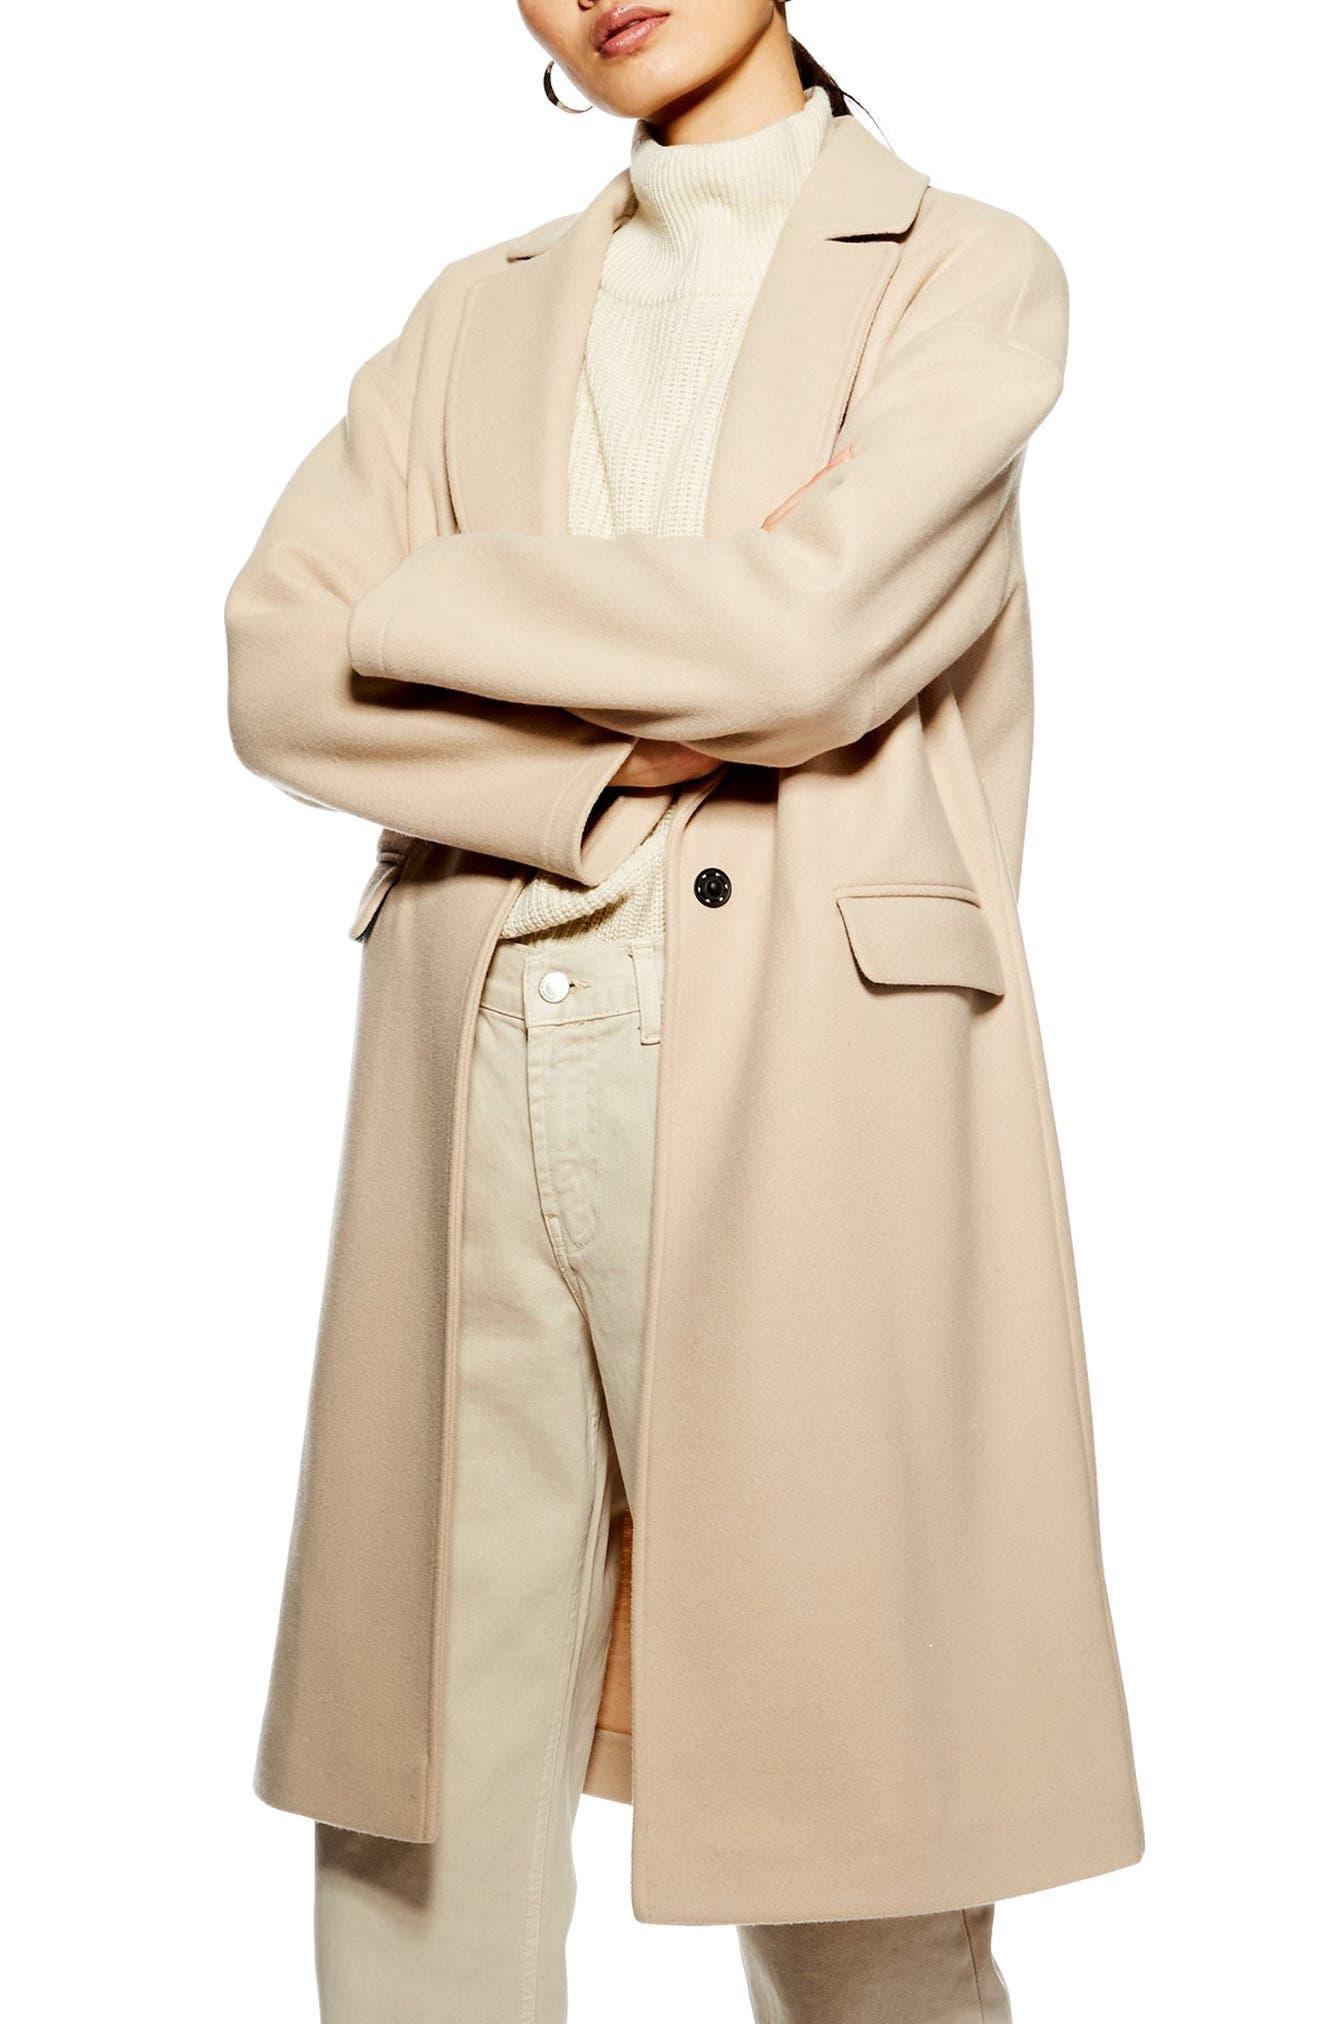 TOPSHOP, Lily Knit Back Midi Coat, Main thumbnail 1, color, 250